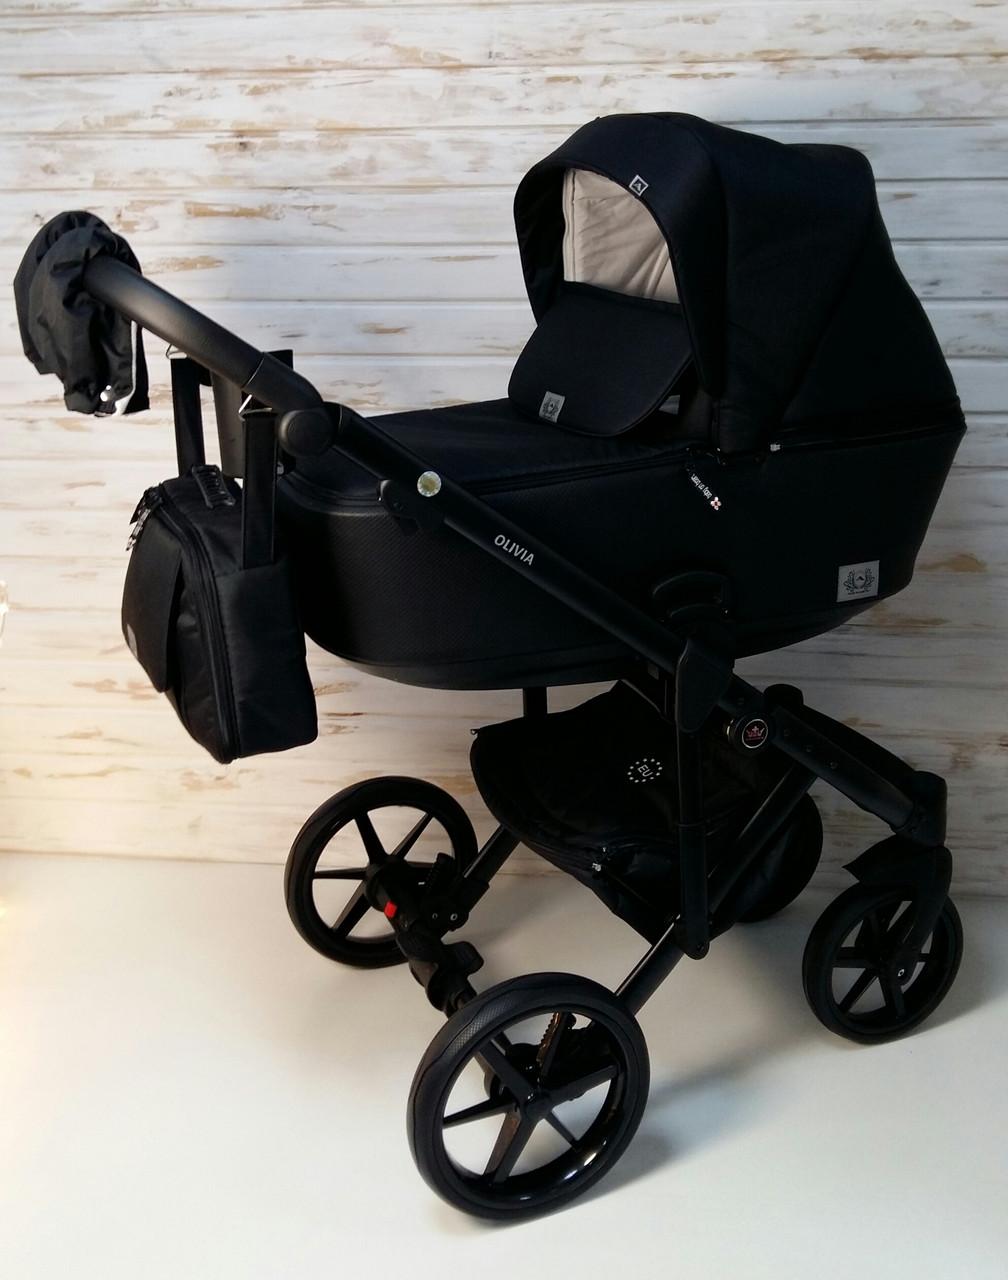 Дитяча універсальна коляска 2 в 1, Коляска Adamex Olivia, Чорна тканина, чорна перфорована еко-шкіра